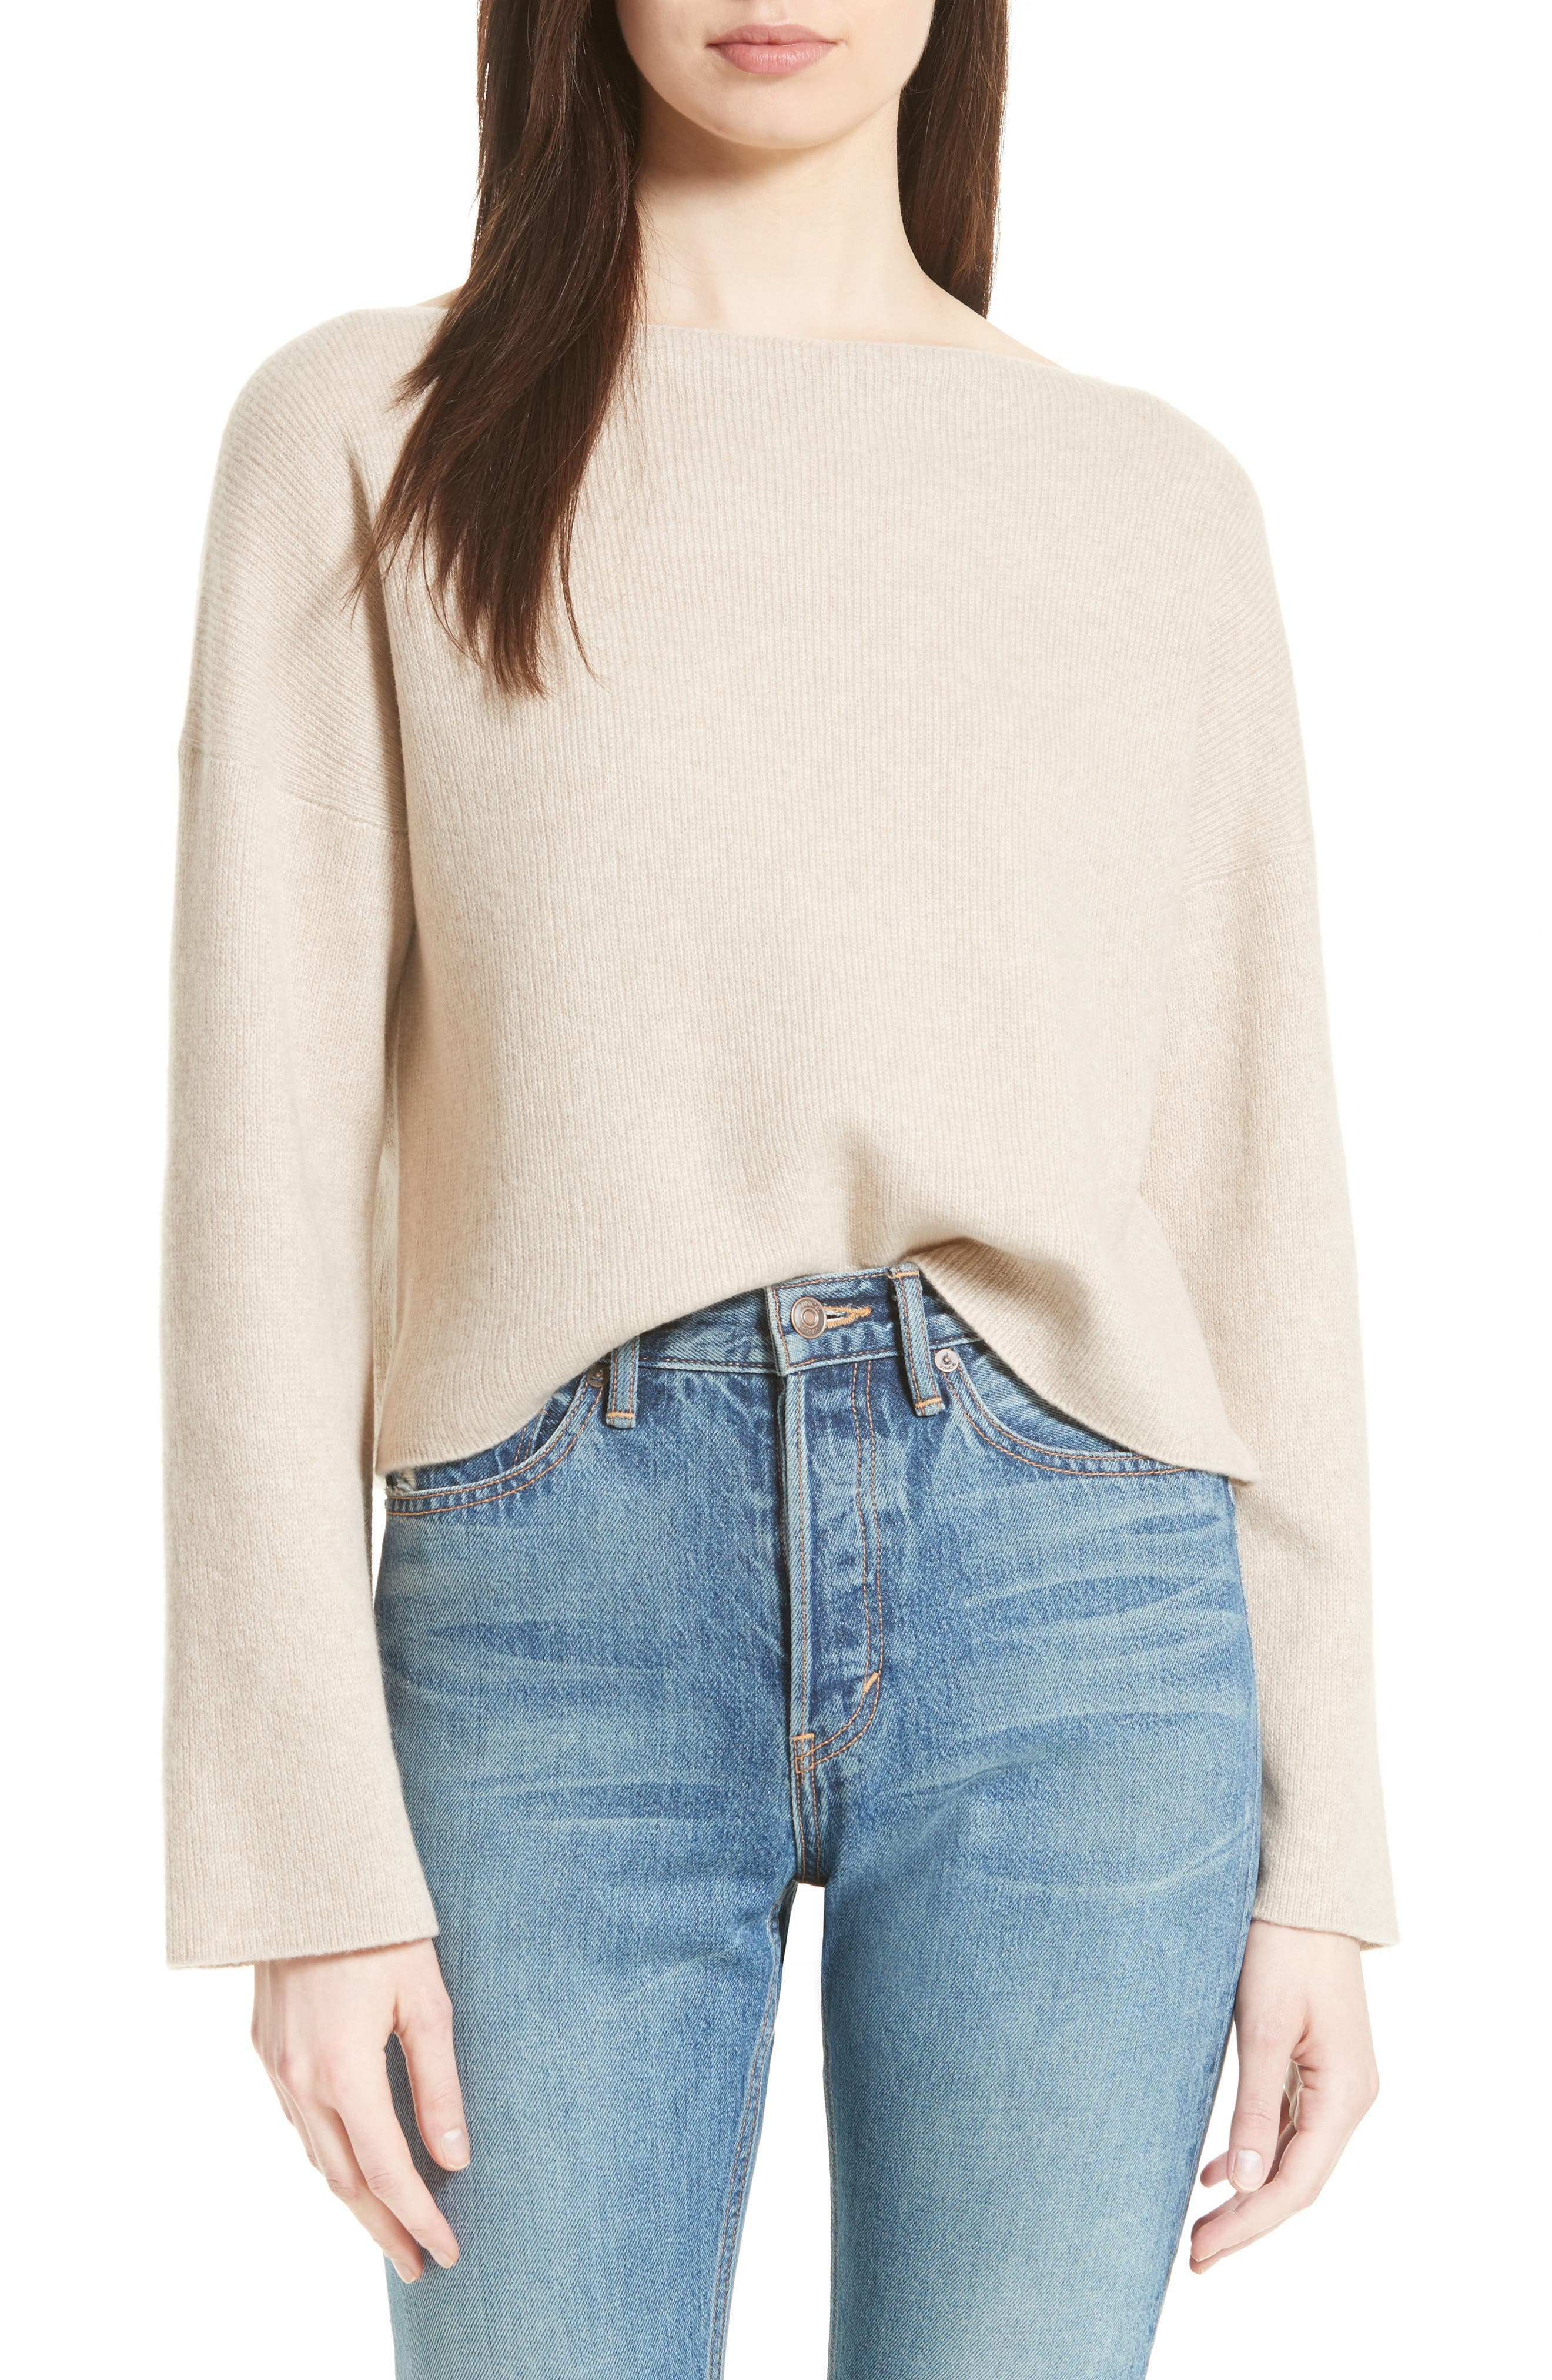 VINCE,                             Boxy Cashmere Sweater,                             Main thumbnail 1, color,                             233